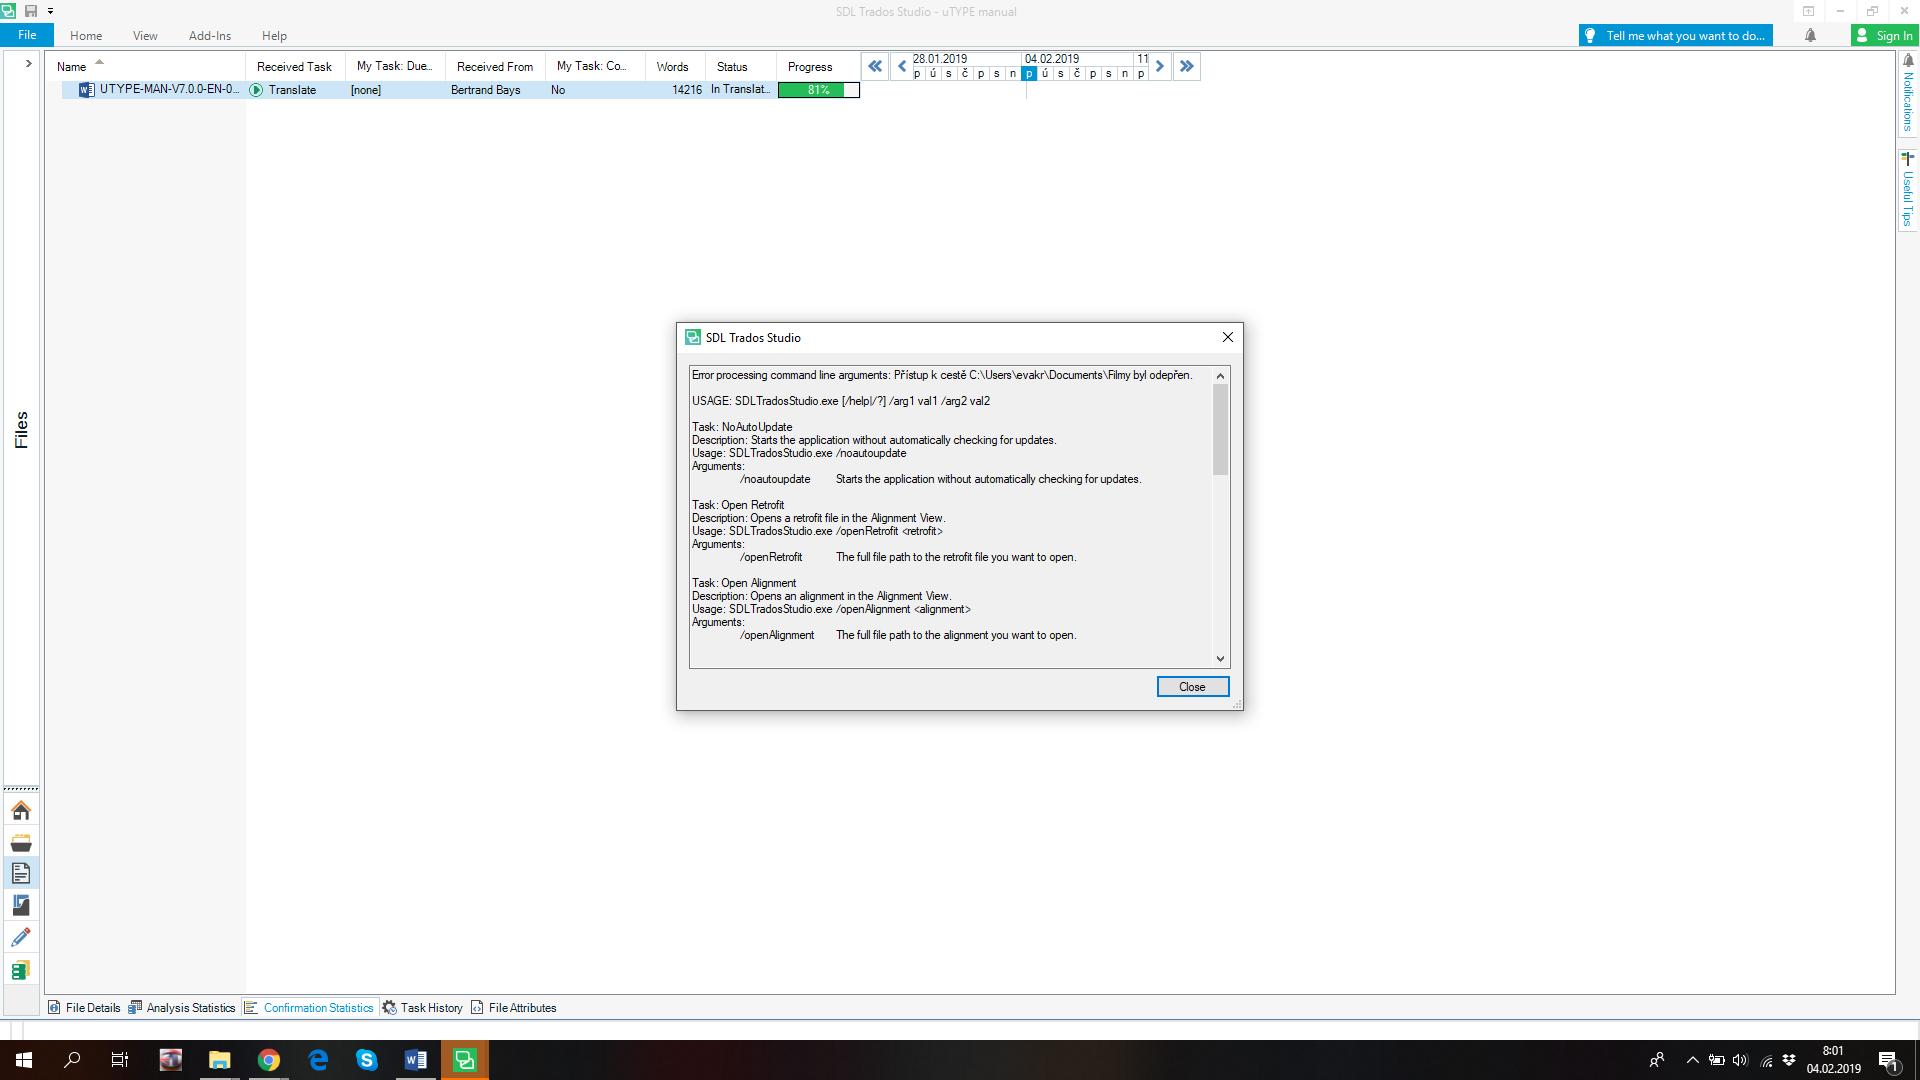 Access denied to folder - renaming didn´t help - SDL Trados Studio